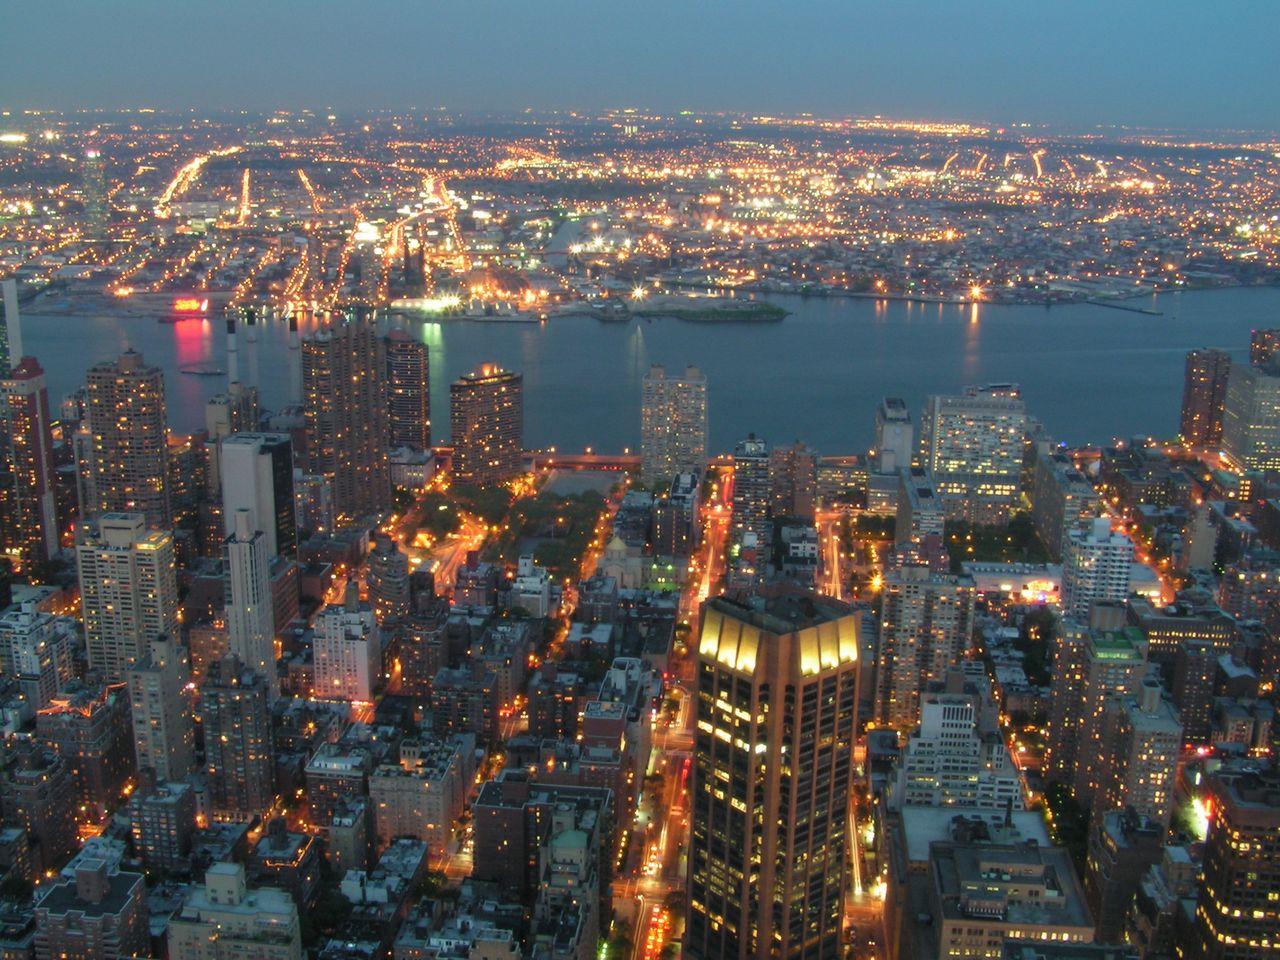 places New York cityscape wallpaperjpg 1280x960